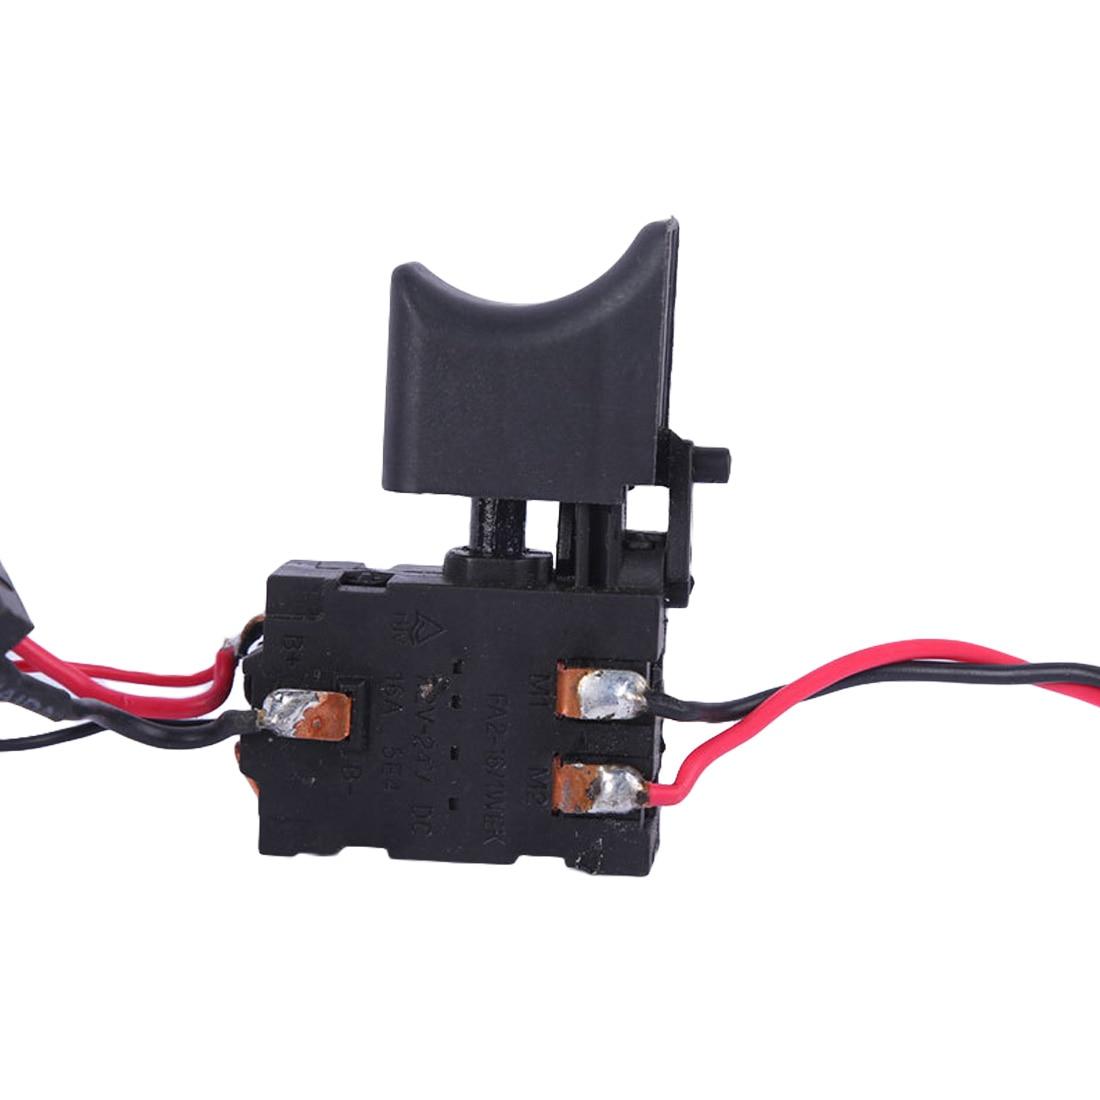 Interruptor De Taladro Inal/ámbrico 7.2 V Interruptor De Disparador De Taladro De Bater/ía De Litio De 24 V Interruptor De Disparador De Control De Velocidad De Taladro Inal/áMbrico Con Interruptor